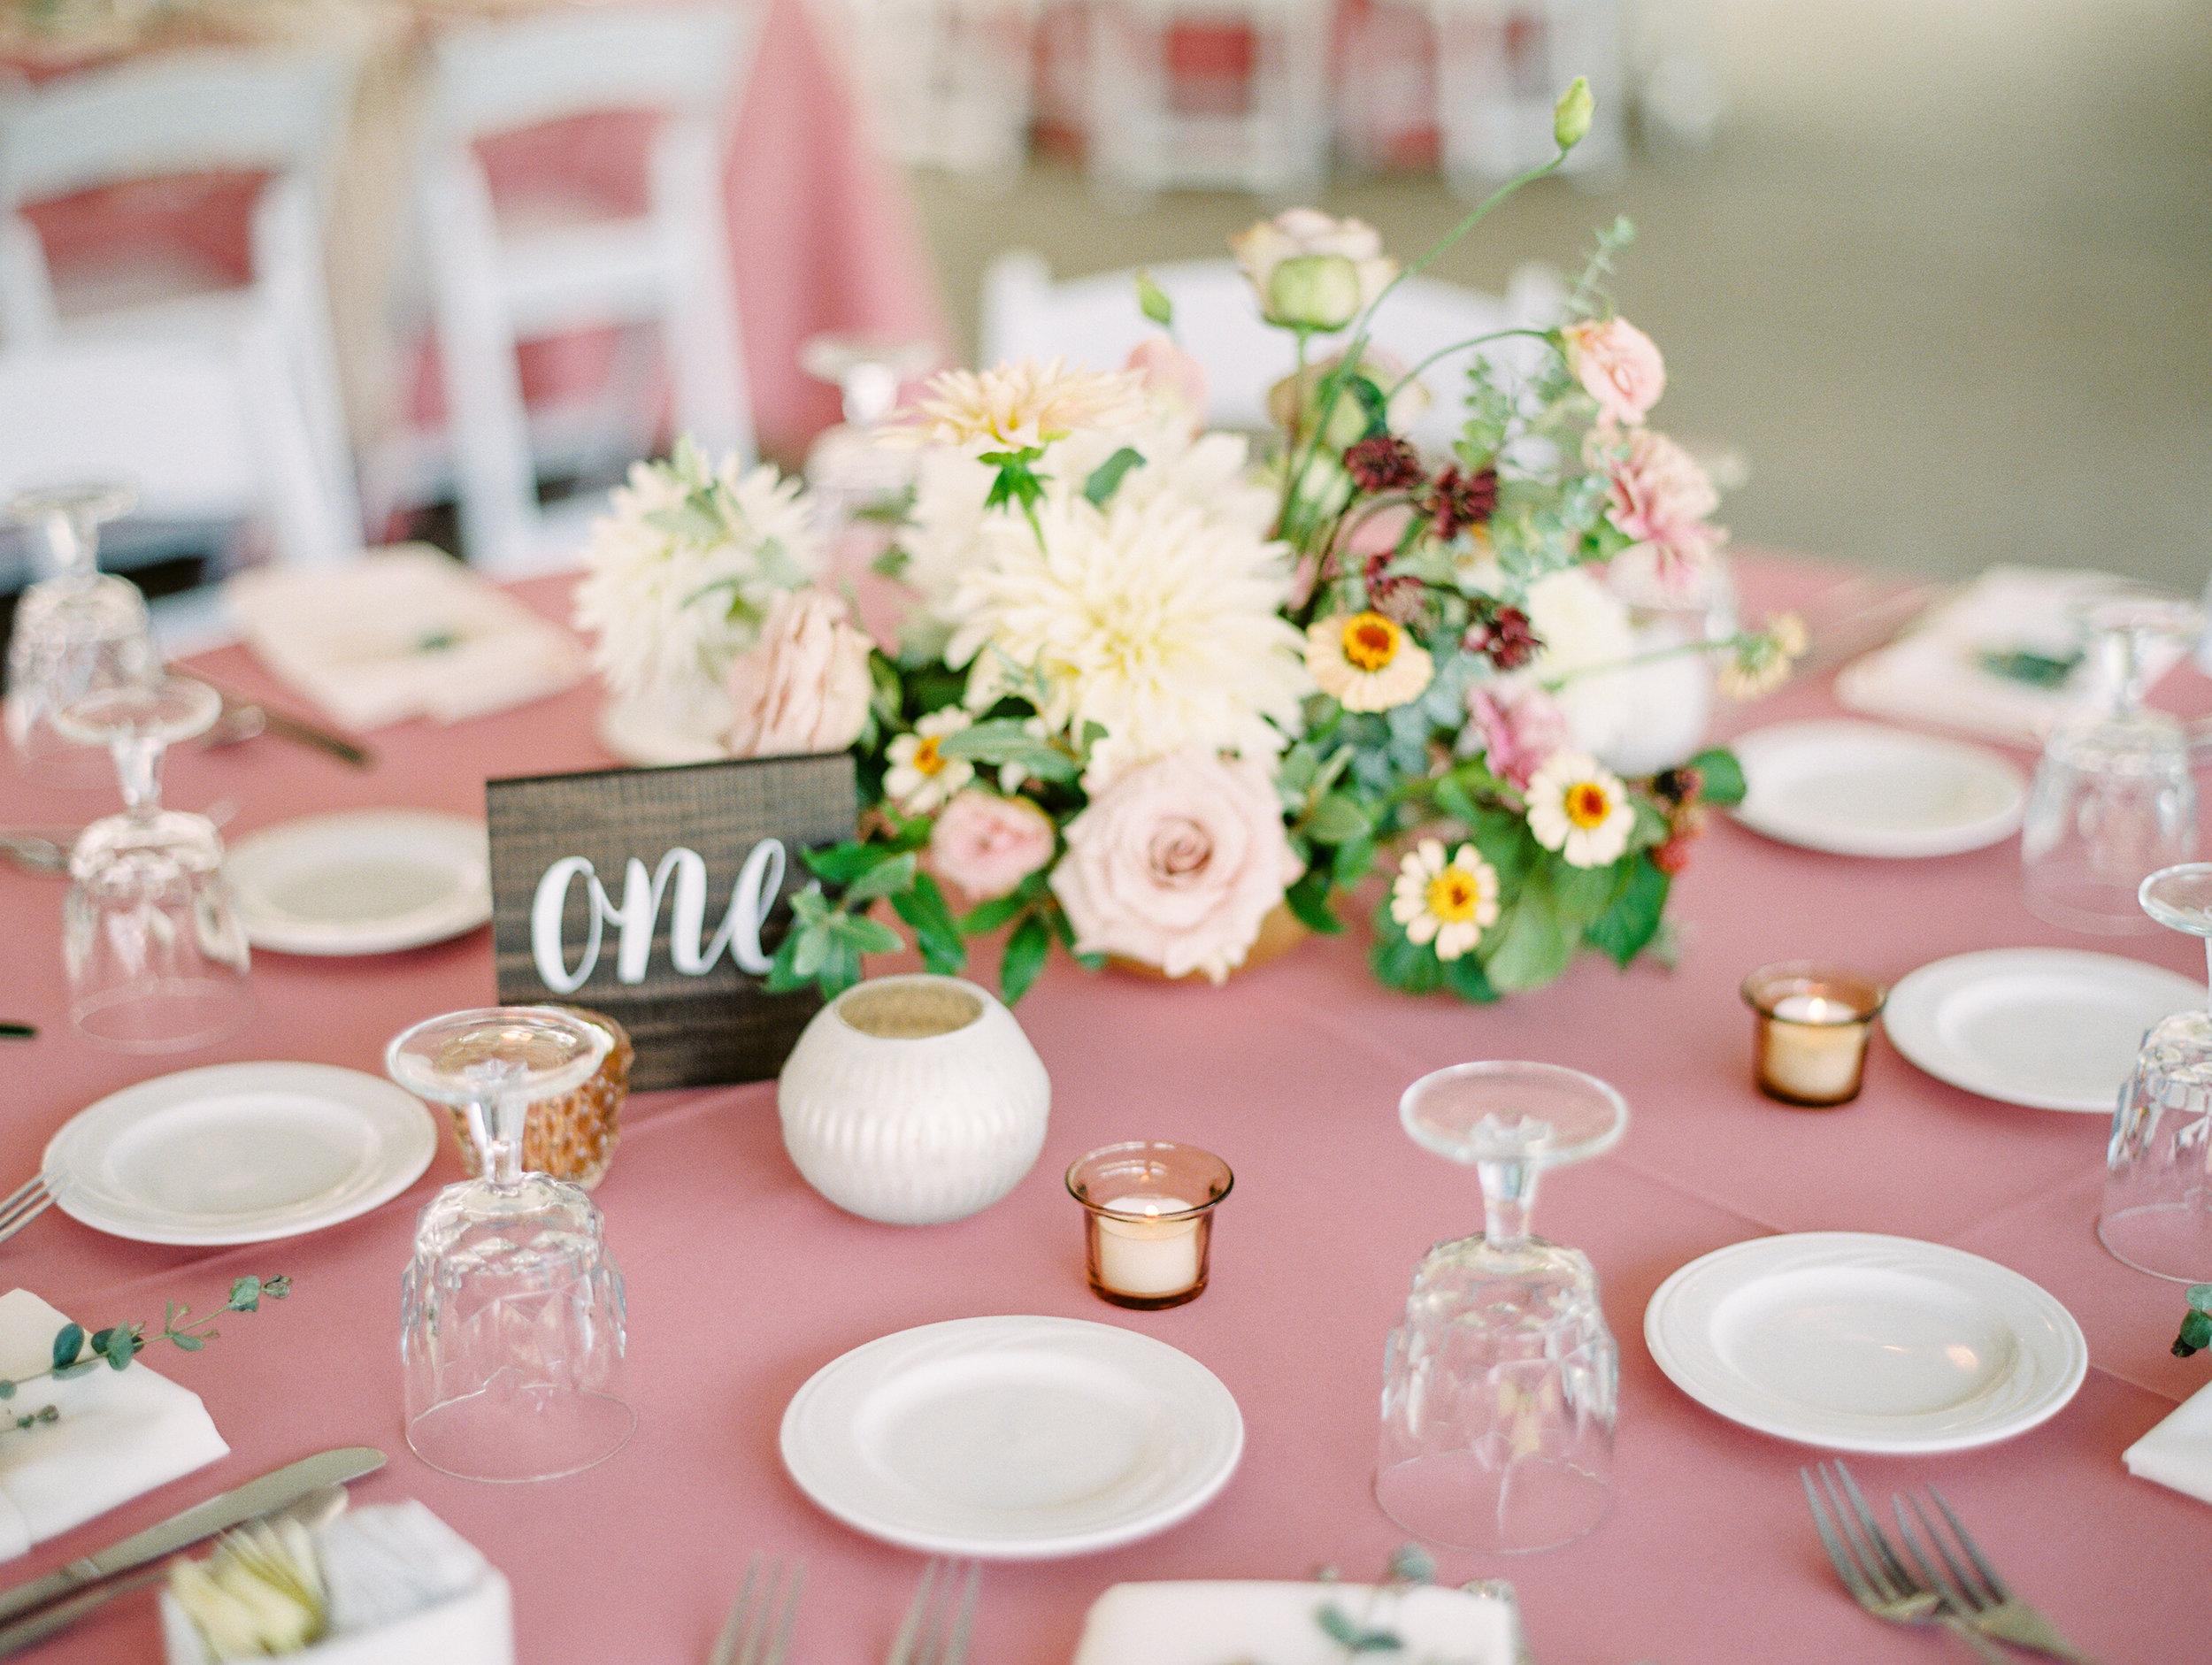 Zoller+Wedding+Reception+Detailsf-18.jpg